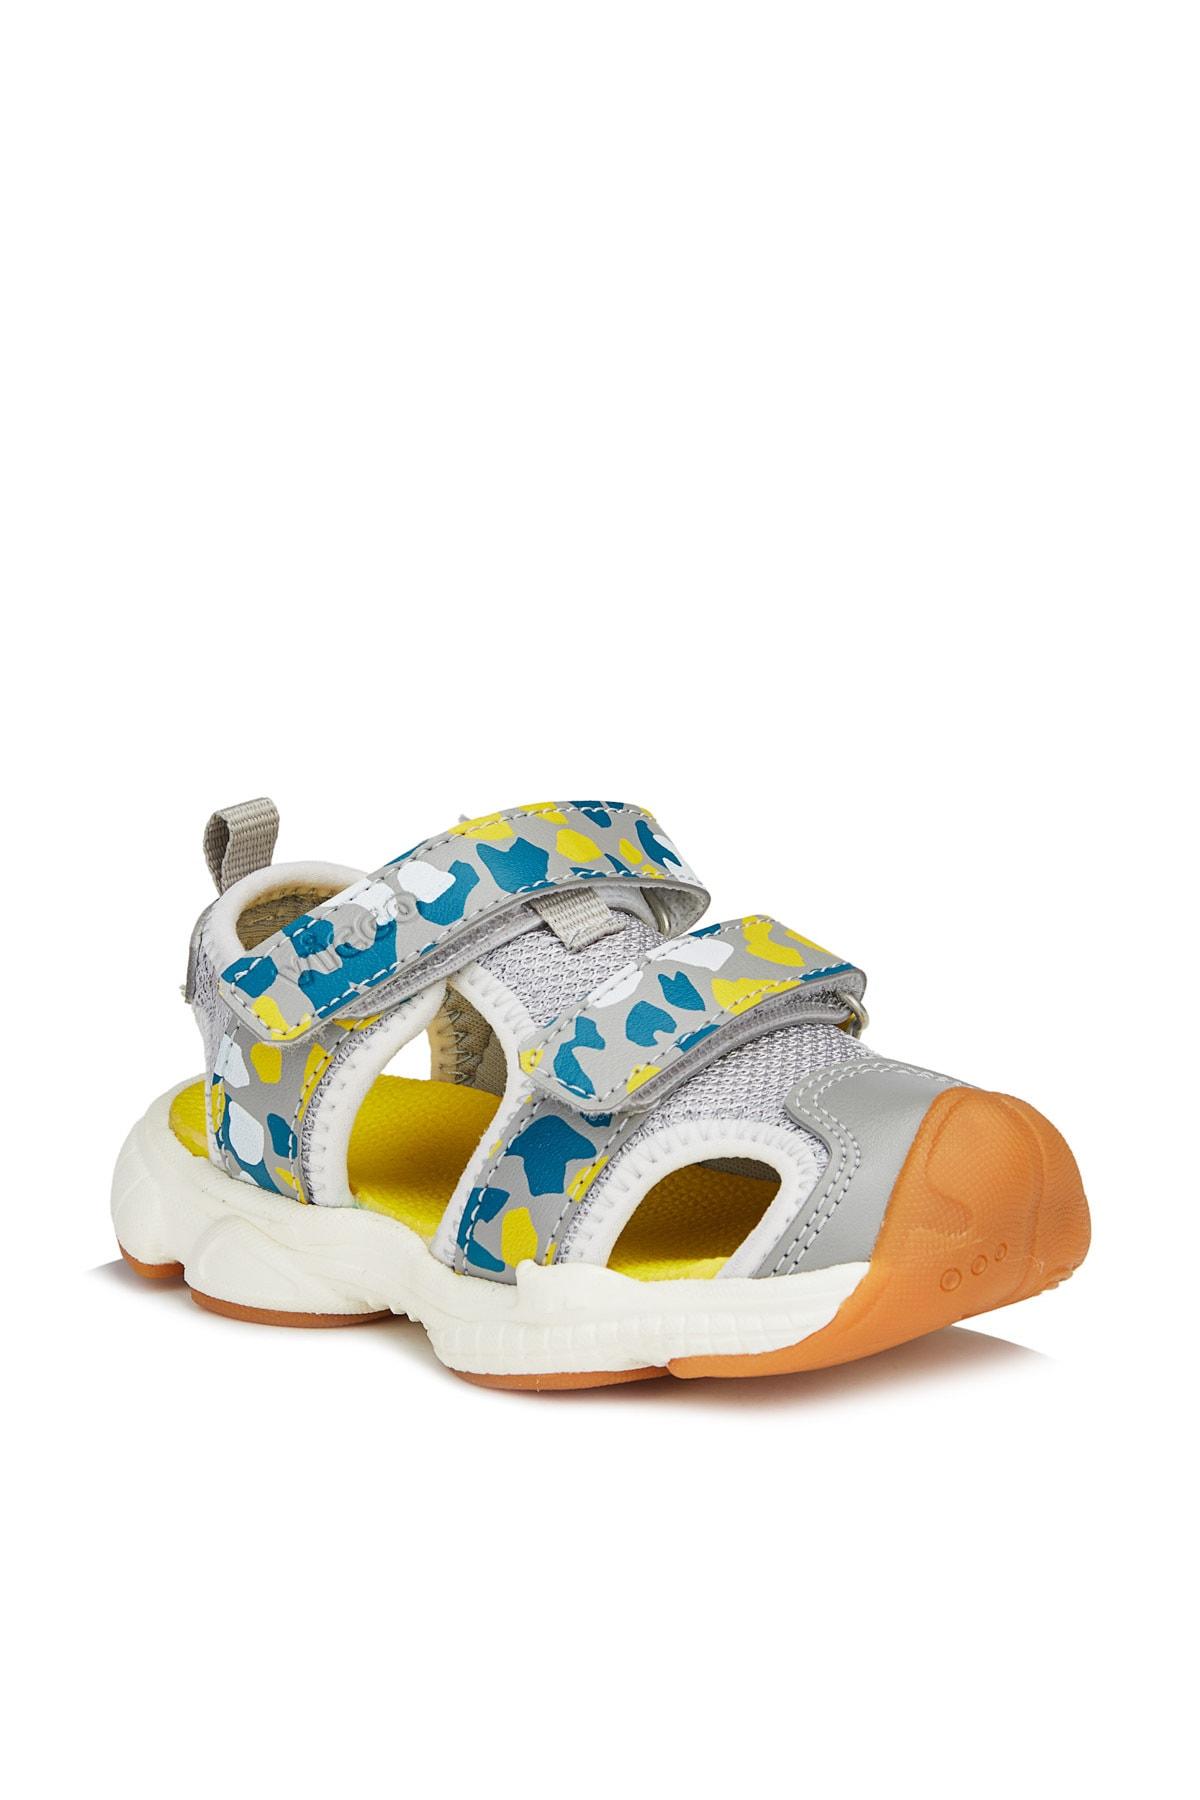 Vicco Leo Erkek Bebe Gri Sandalet 1